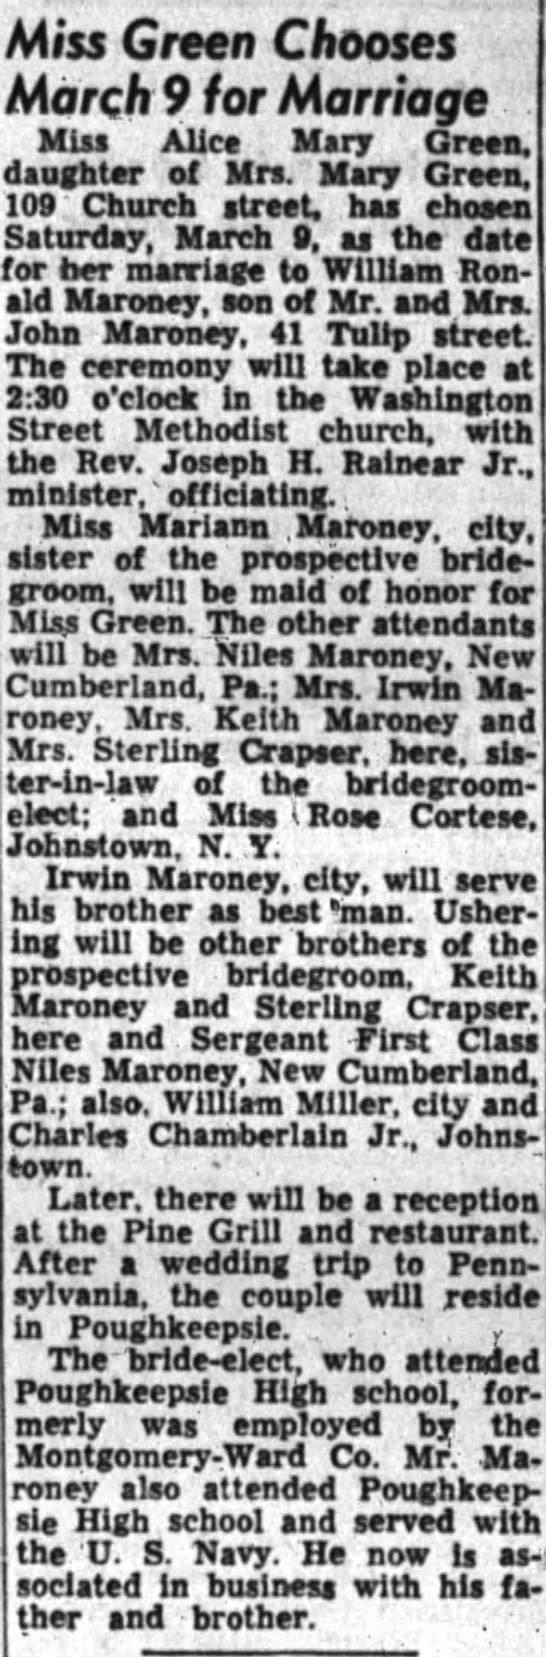 Miss Alice Green to Marry William Maroney.